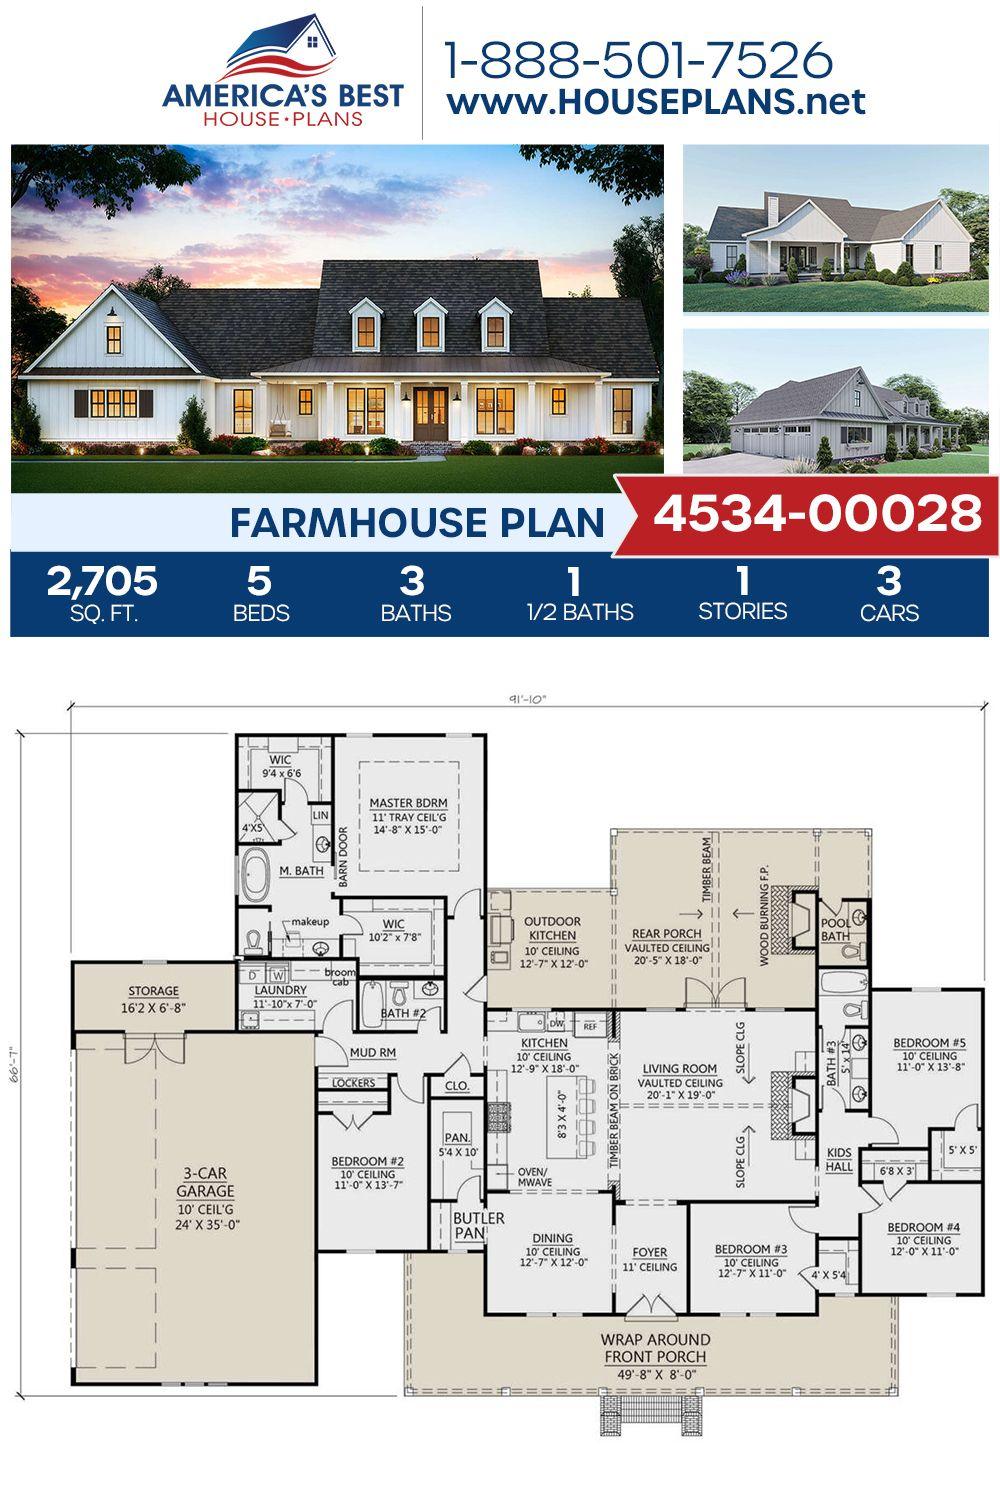 House Plan 4534 00028 Modern Farmhouse Plan 2 705 Square Feet 5 Bedrooms 3 5 Bathrooms In 2020 Modern Farmhouse Plans Farmhouse Plans House Plans Farmhouse